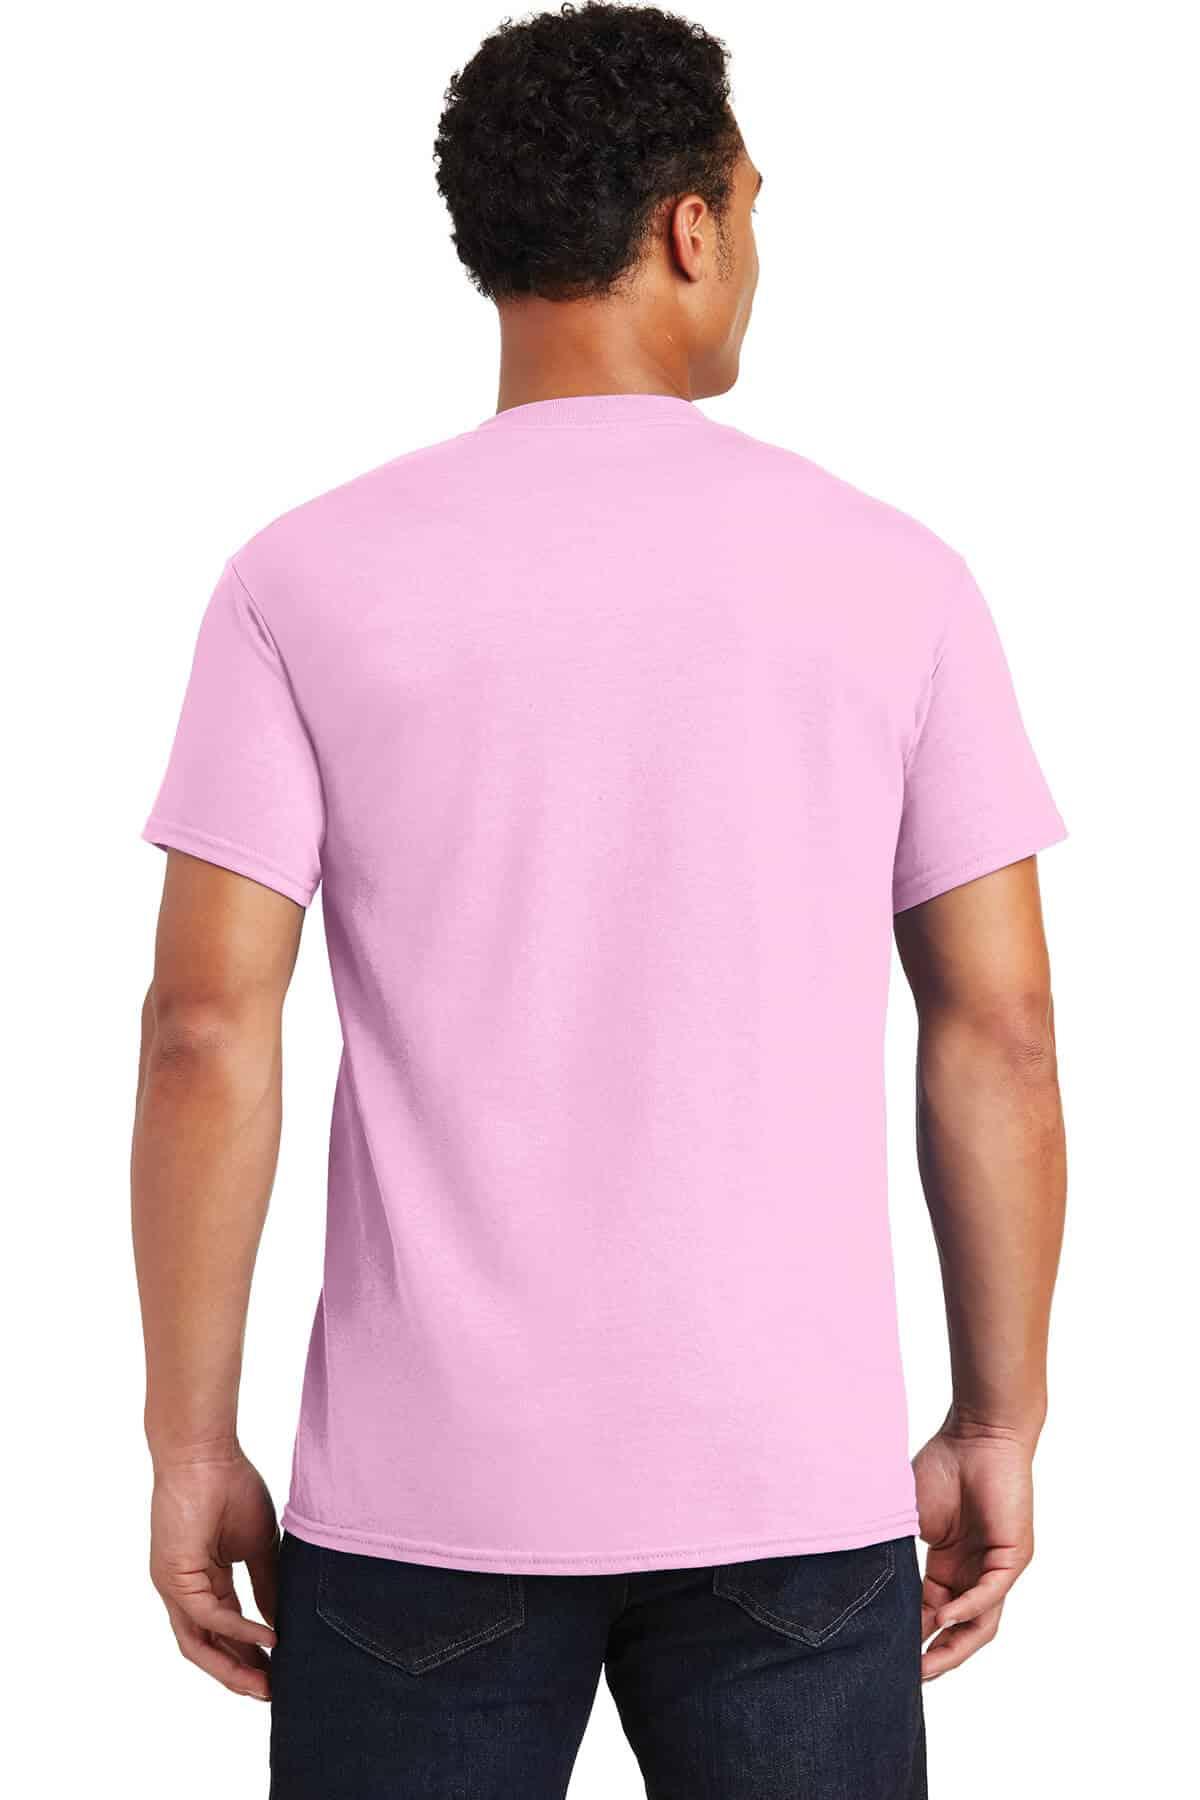 Light Pink TeeShirt Back